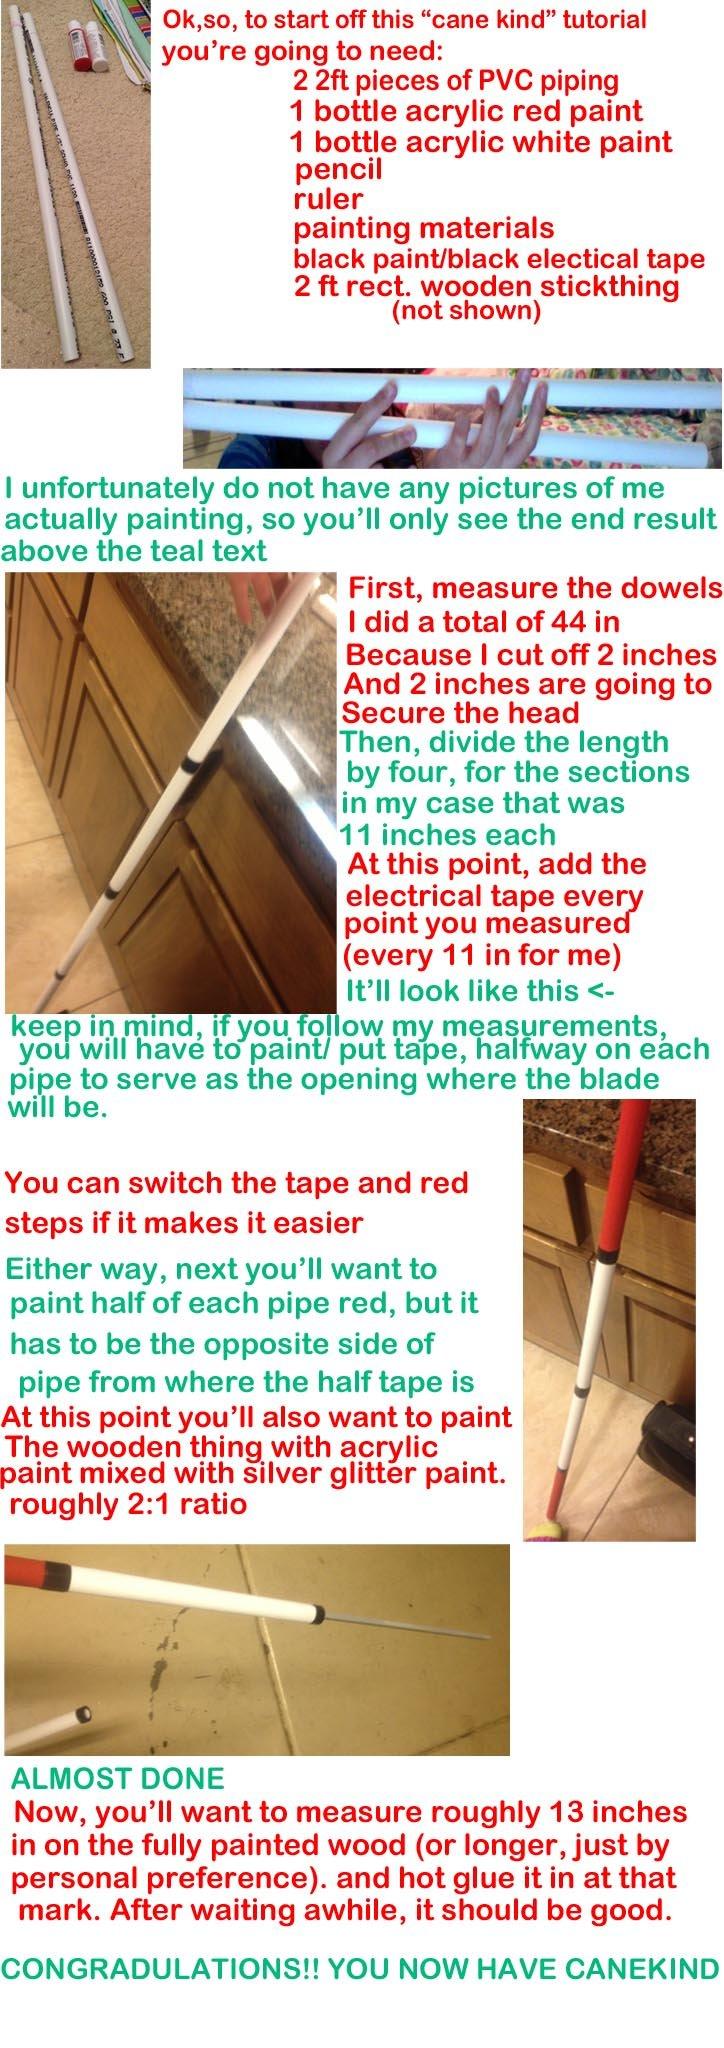 Terezi's cane tutorial